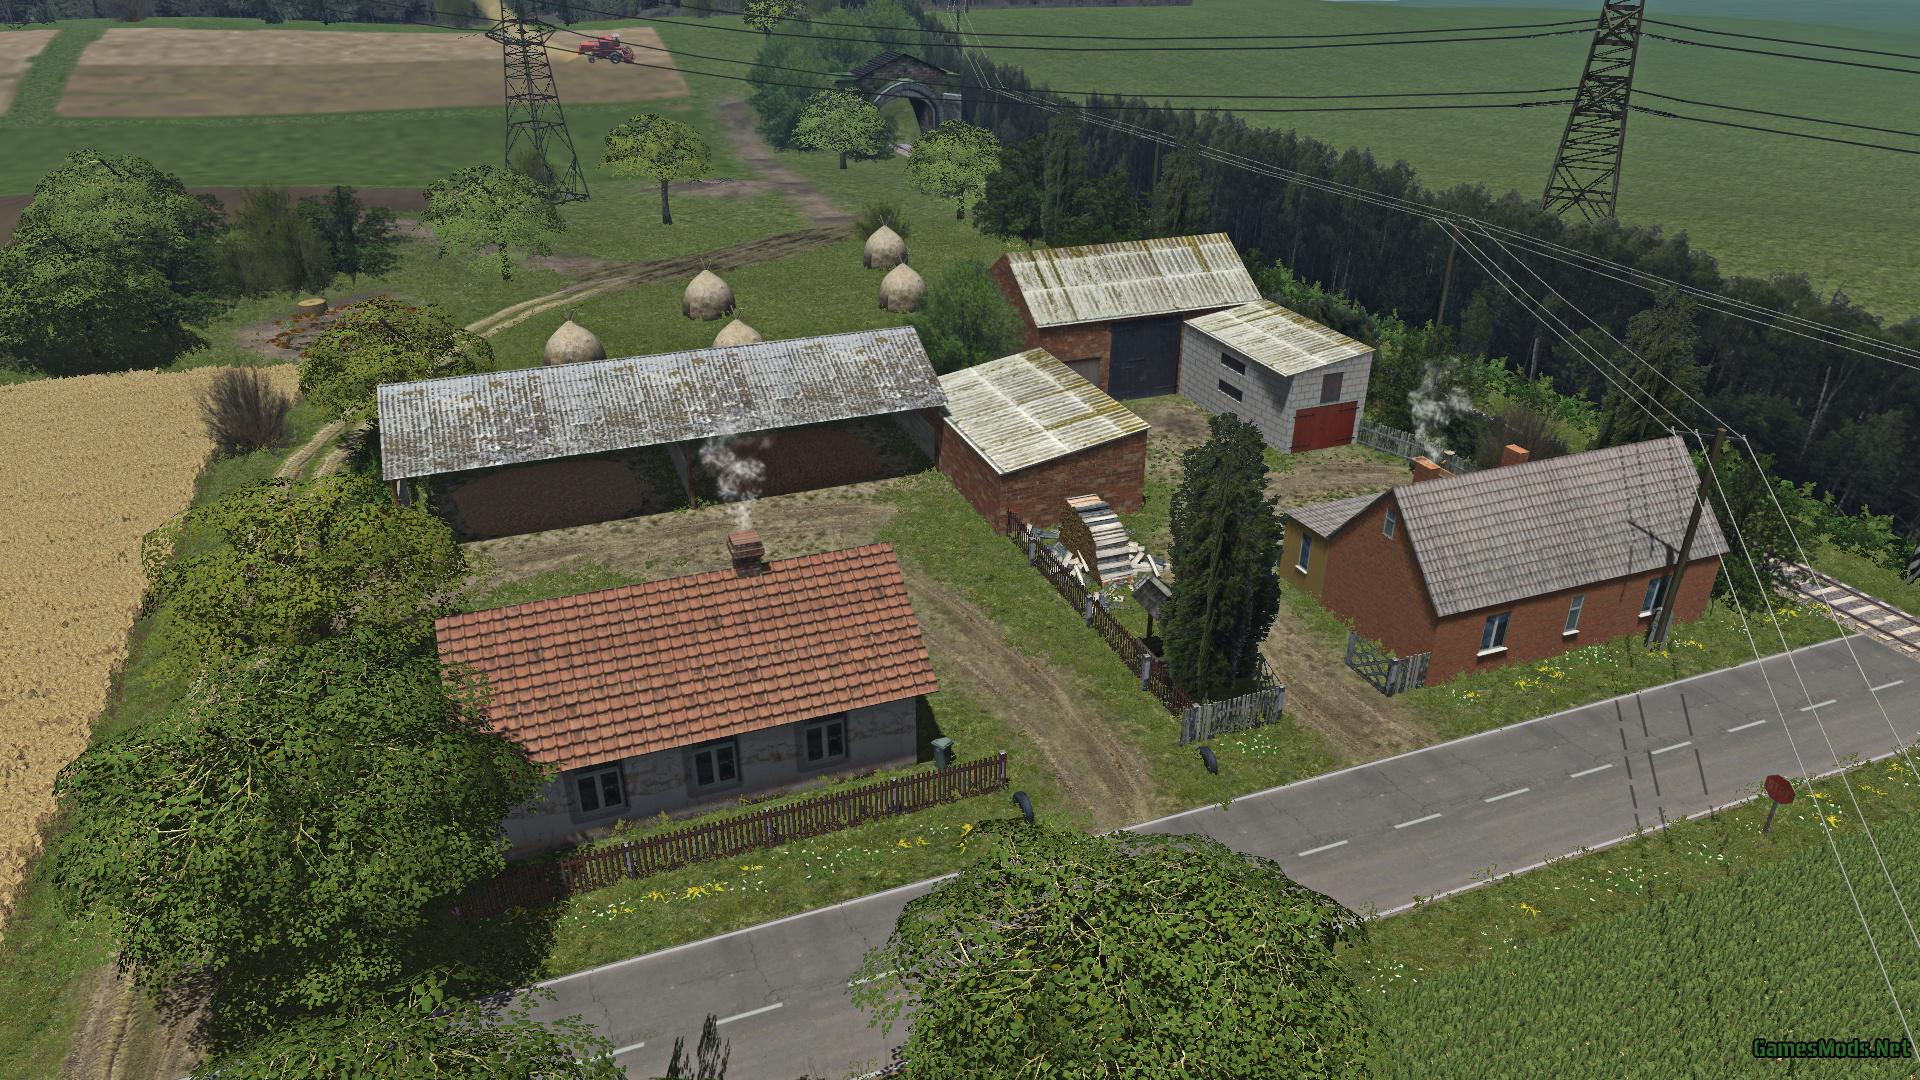 Polish Small Village v1 » GamesMods.net - FS17, CNC, FS15, ETS 2 mods